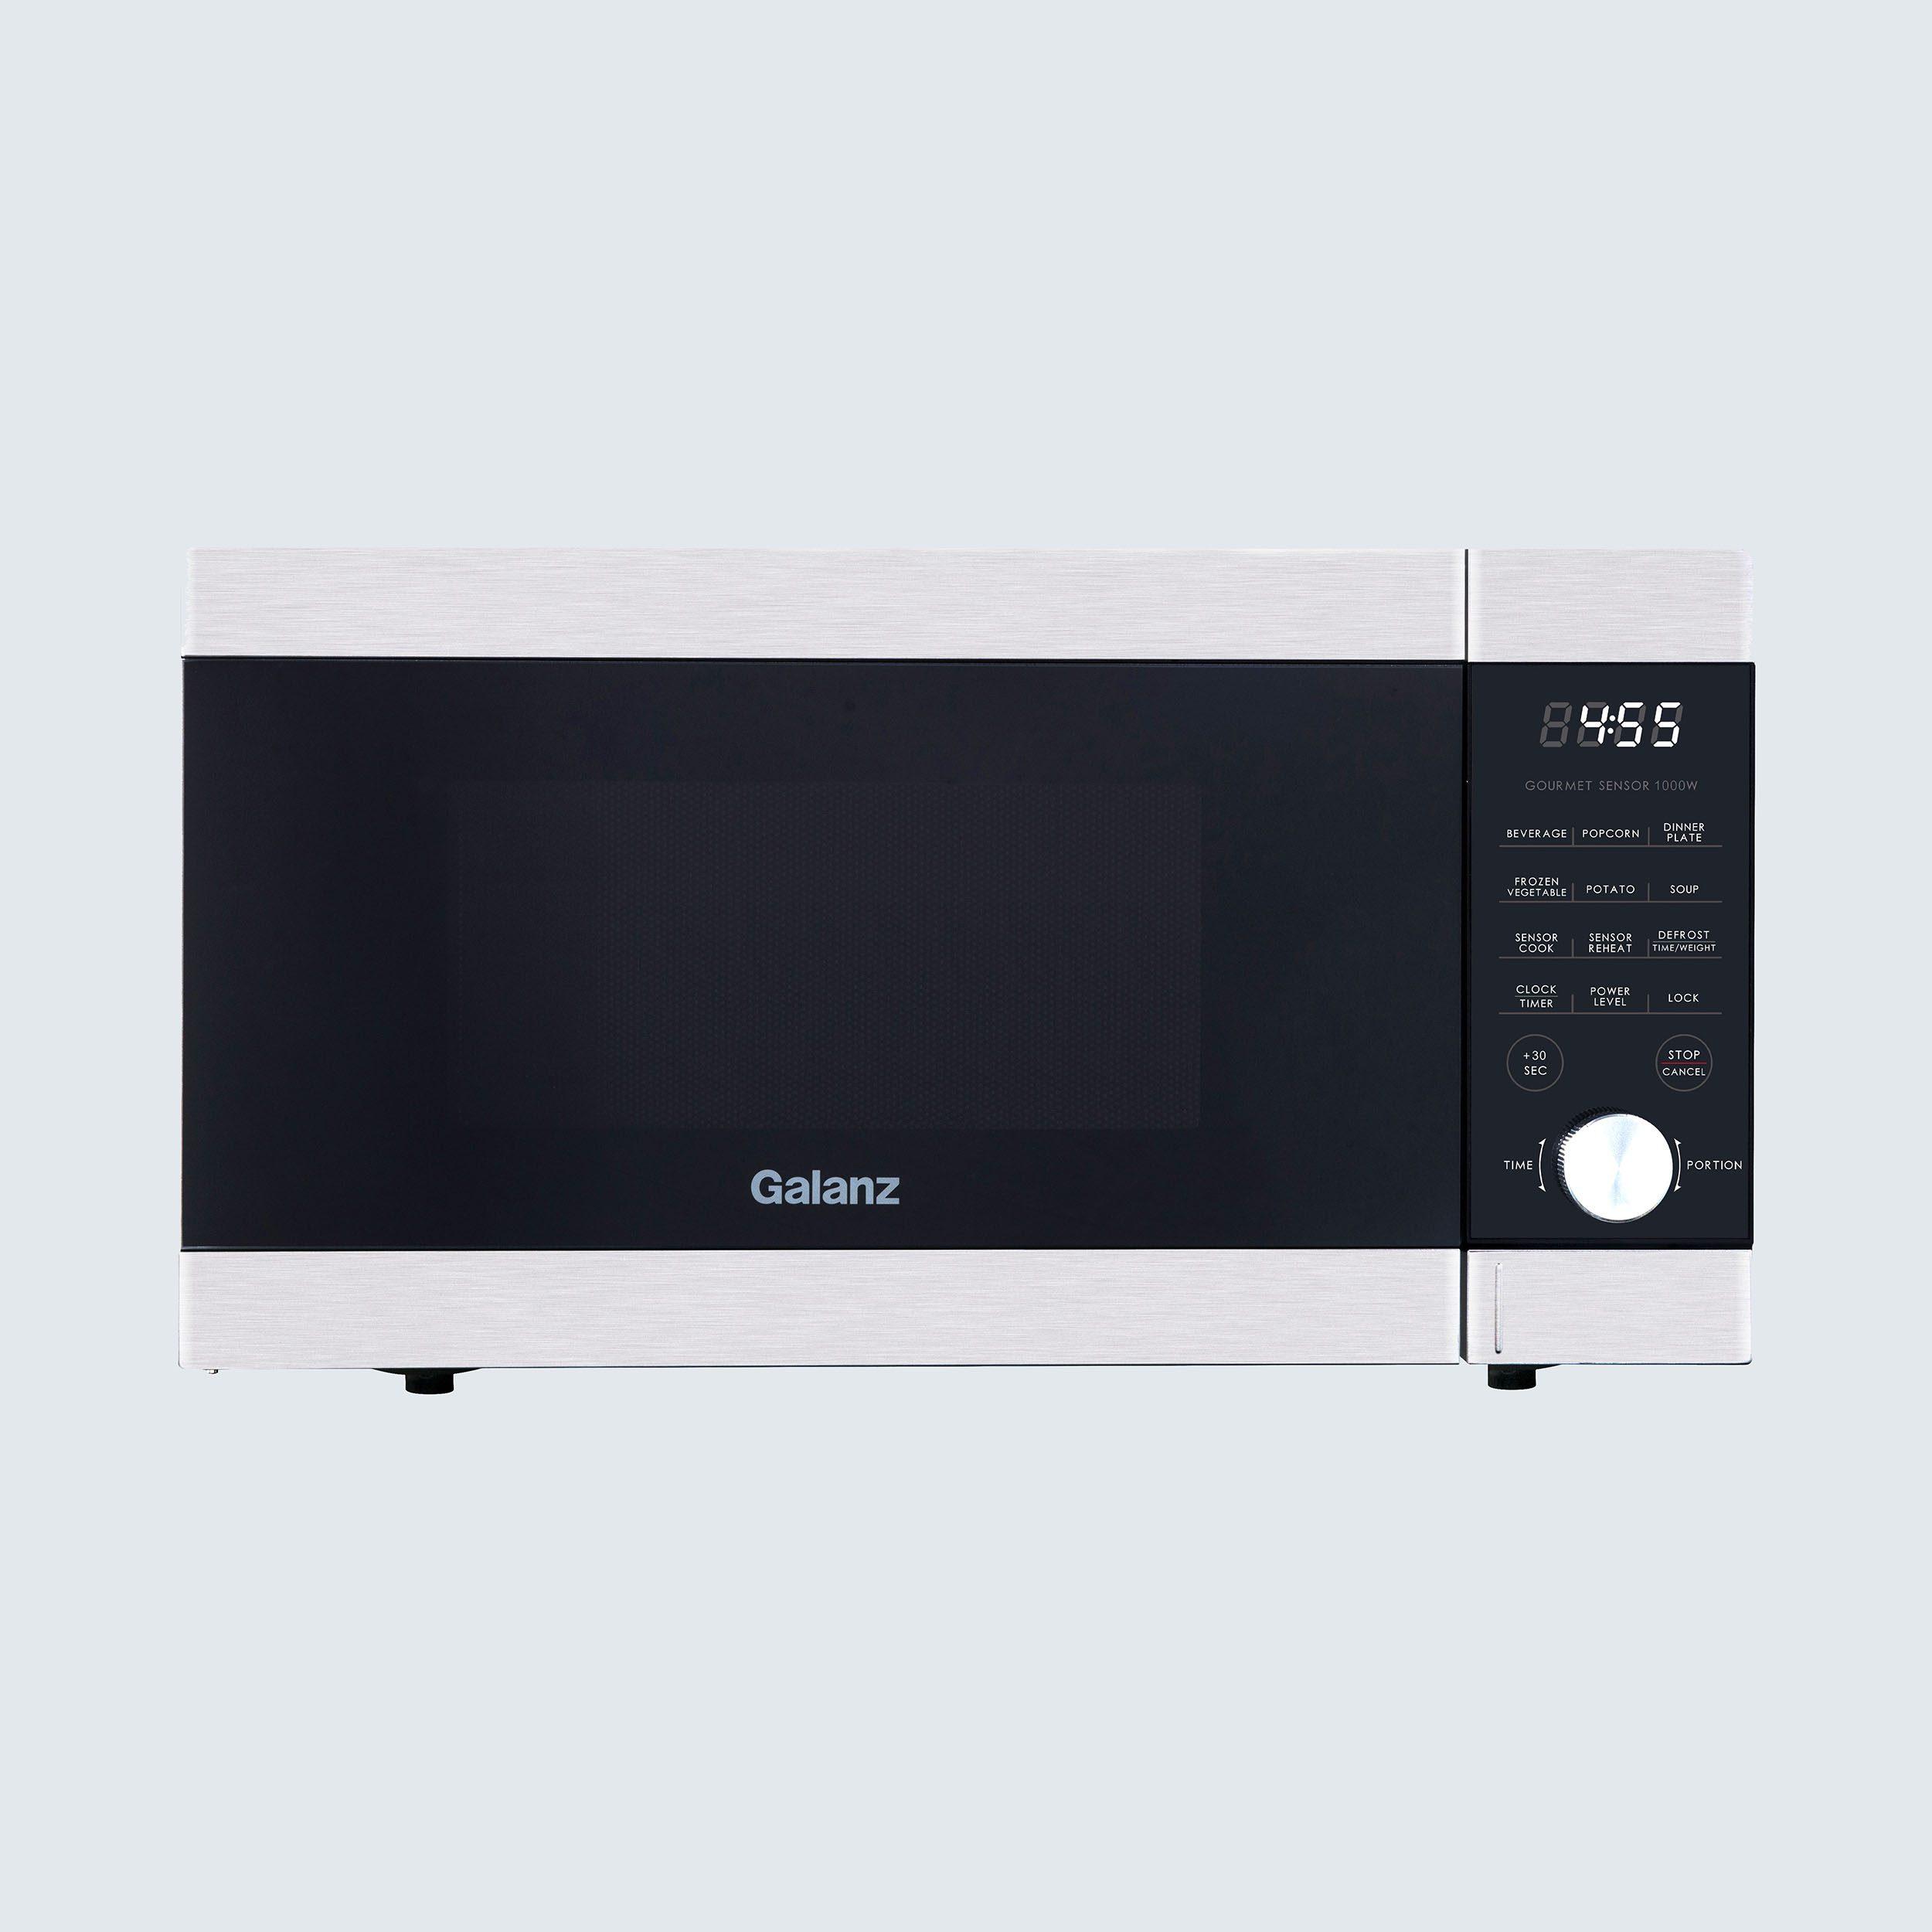 Galanz ExpressWave Sensor Cooking Microwave